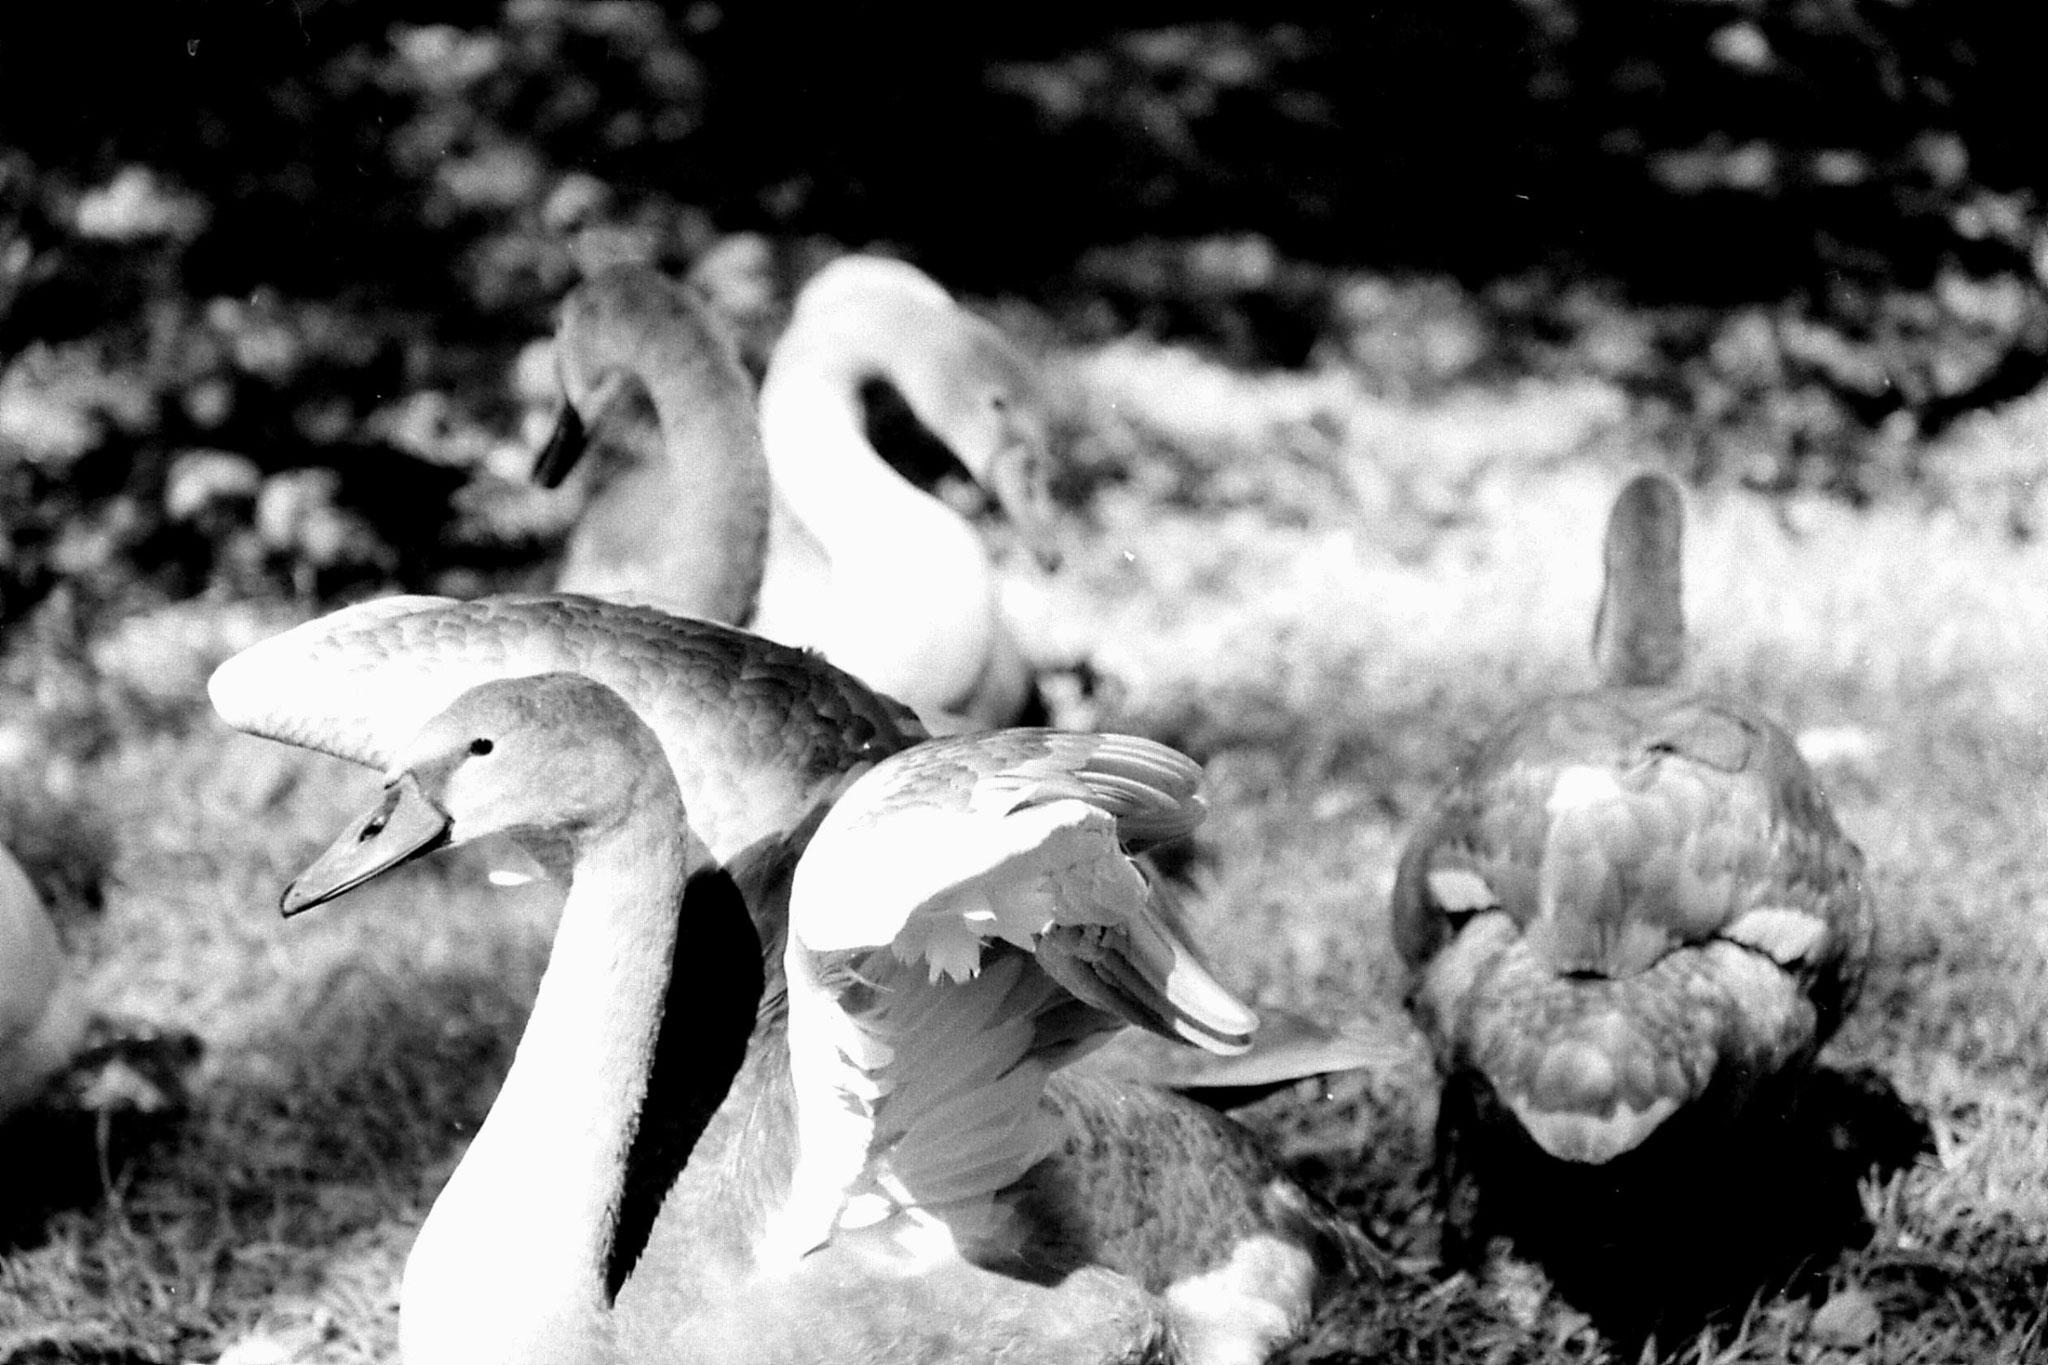 7/9/1988: 38: swans